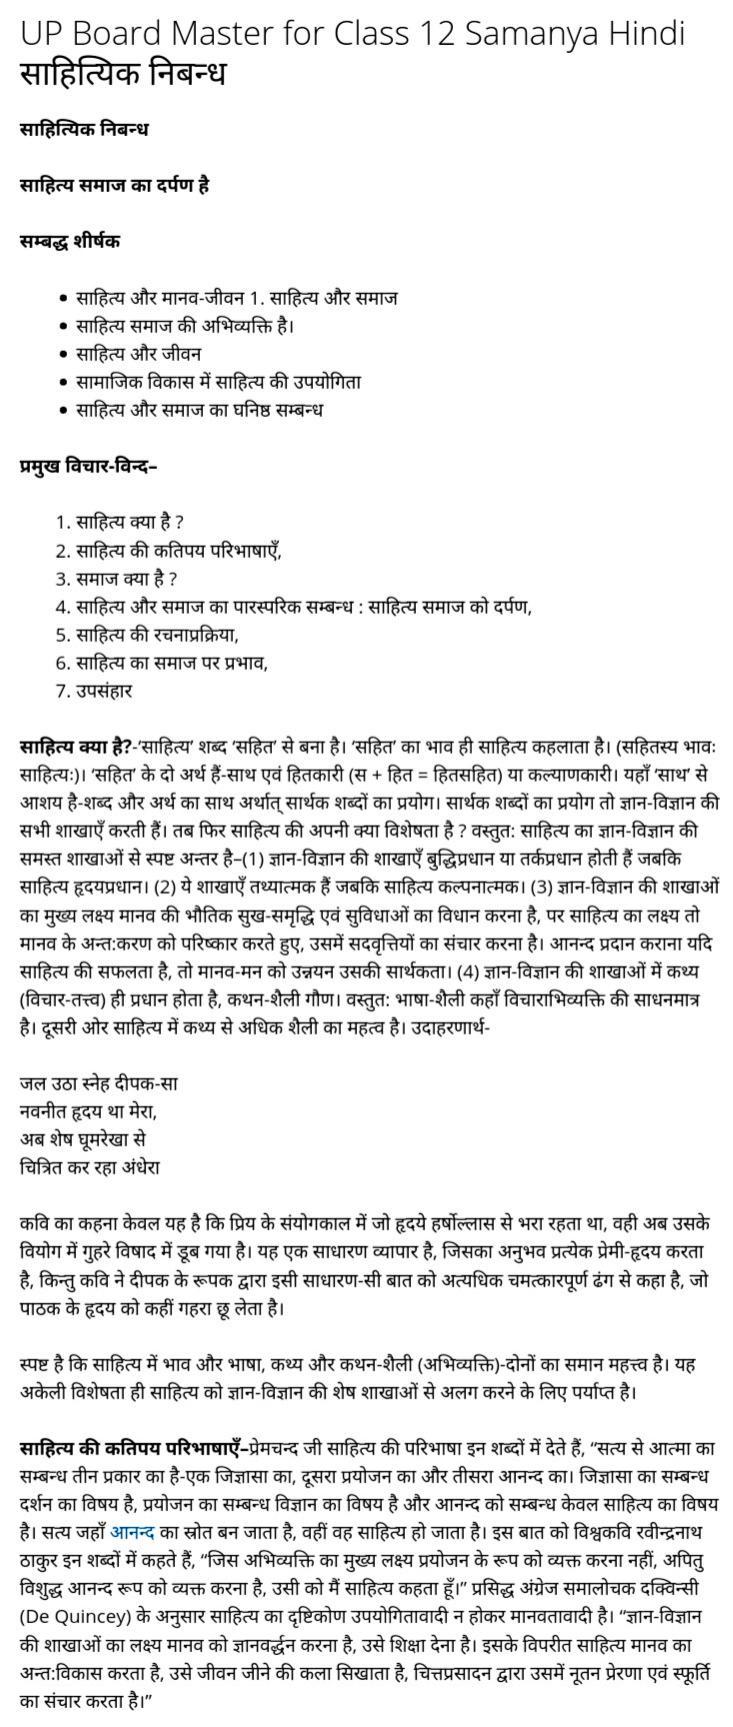 UP Board Solutions for Class 12 Samanya Hindi साहित्यिक निबन्ध